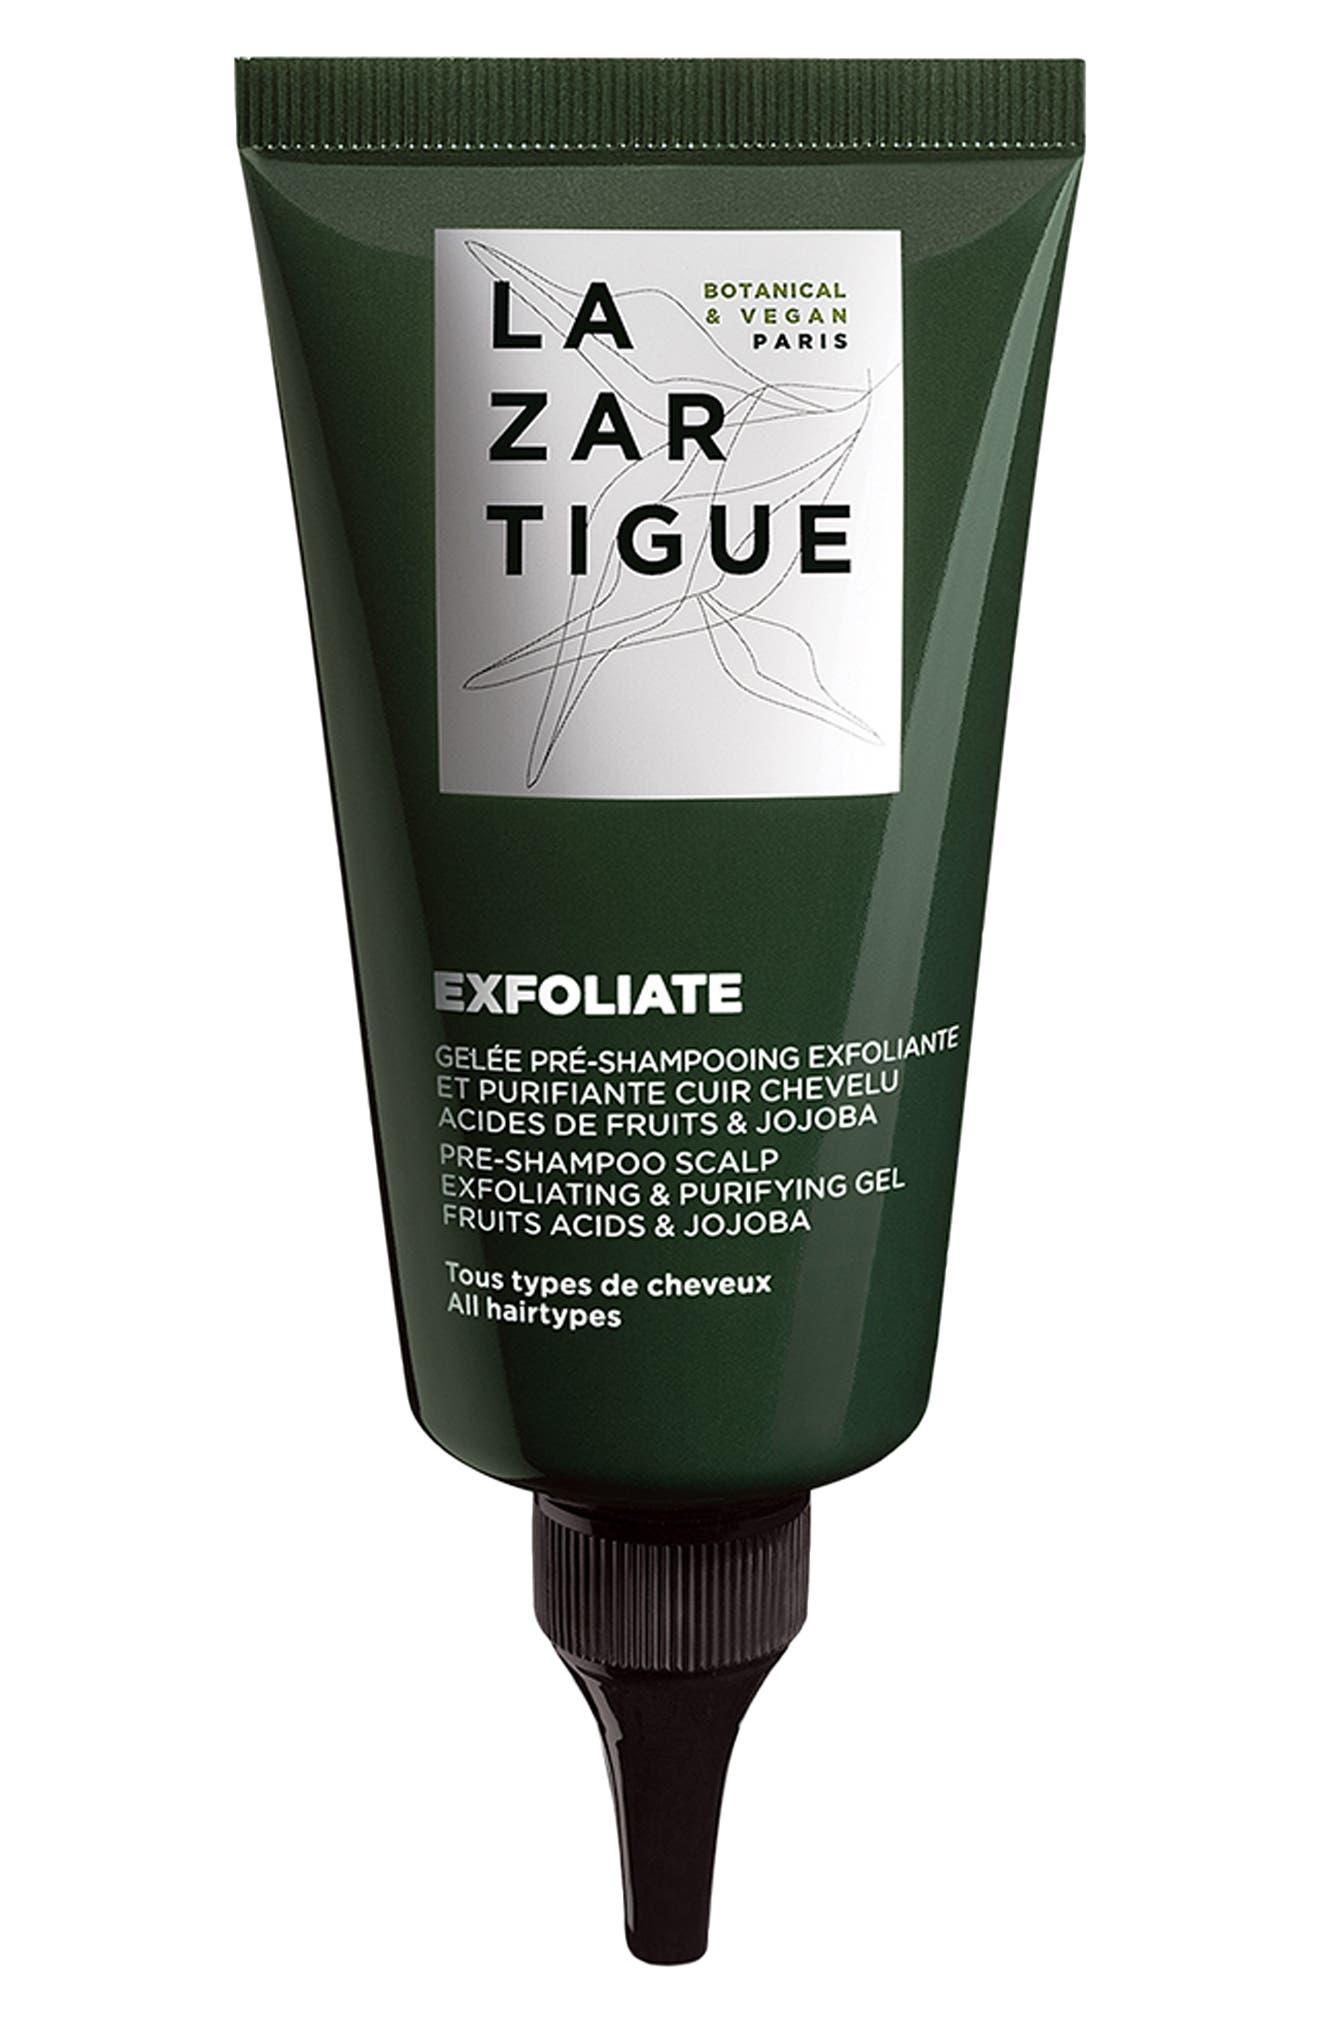 Exfoliate Pre-Shampoo Scalp Exfoliating & Purifying Gel